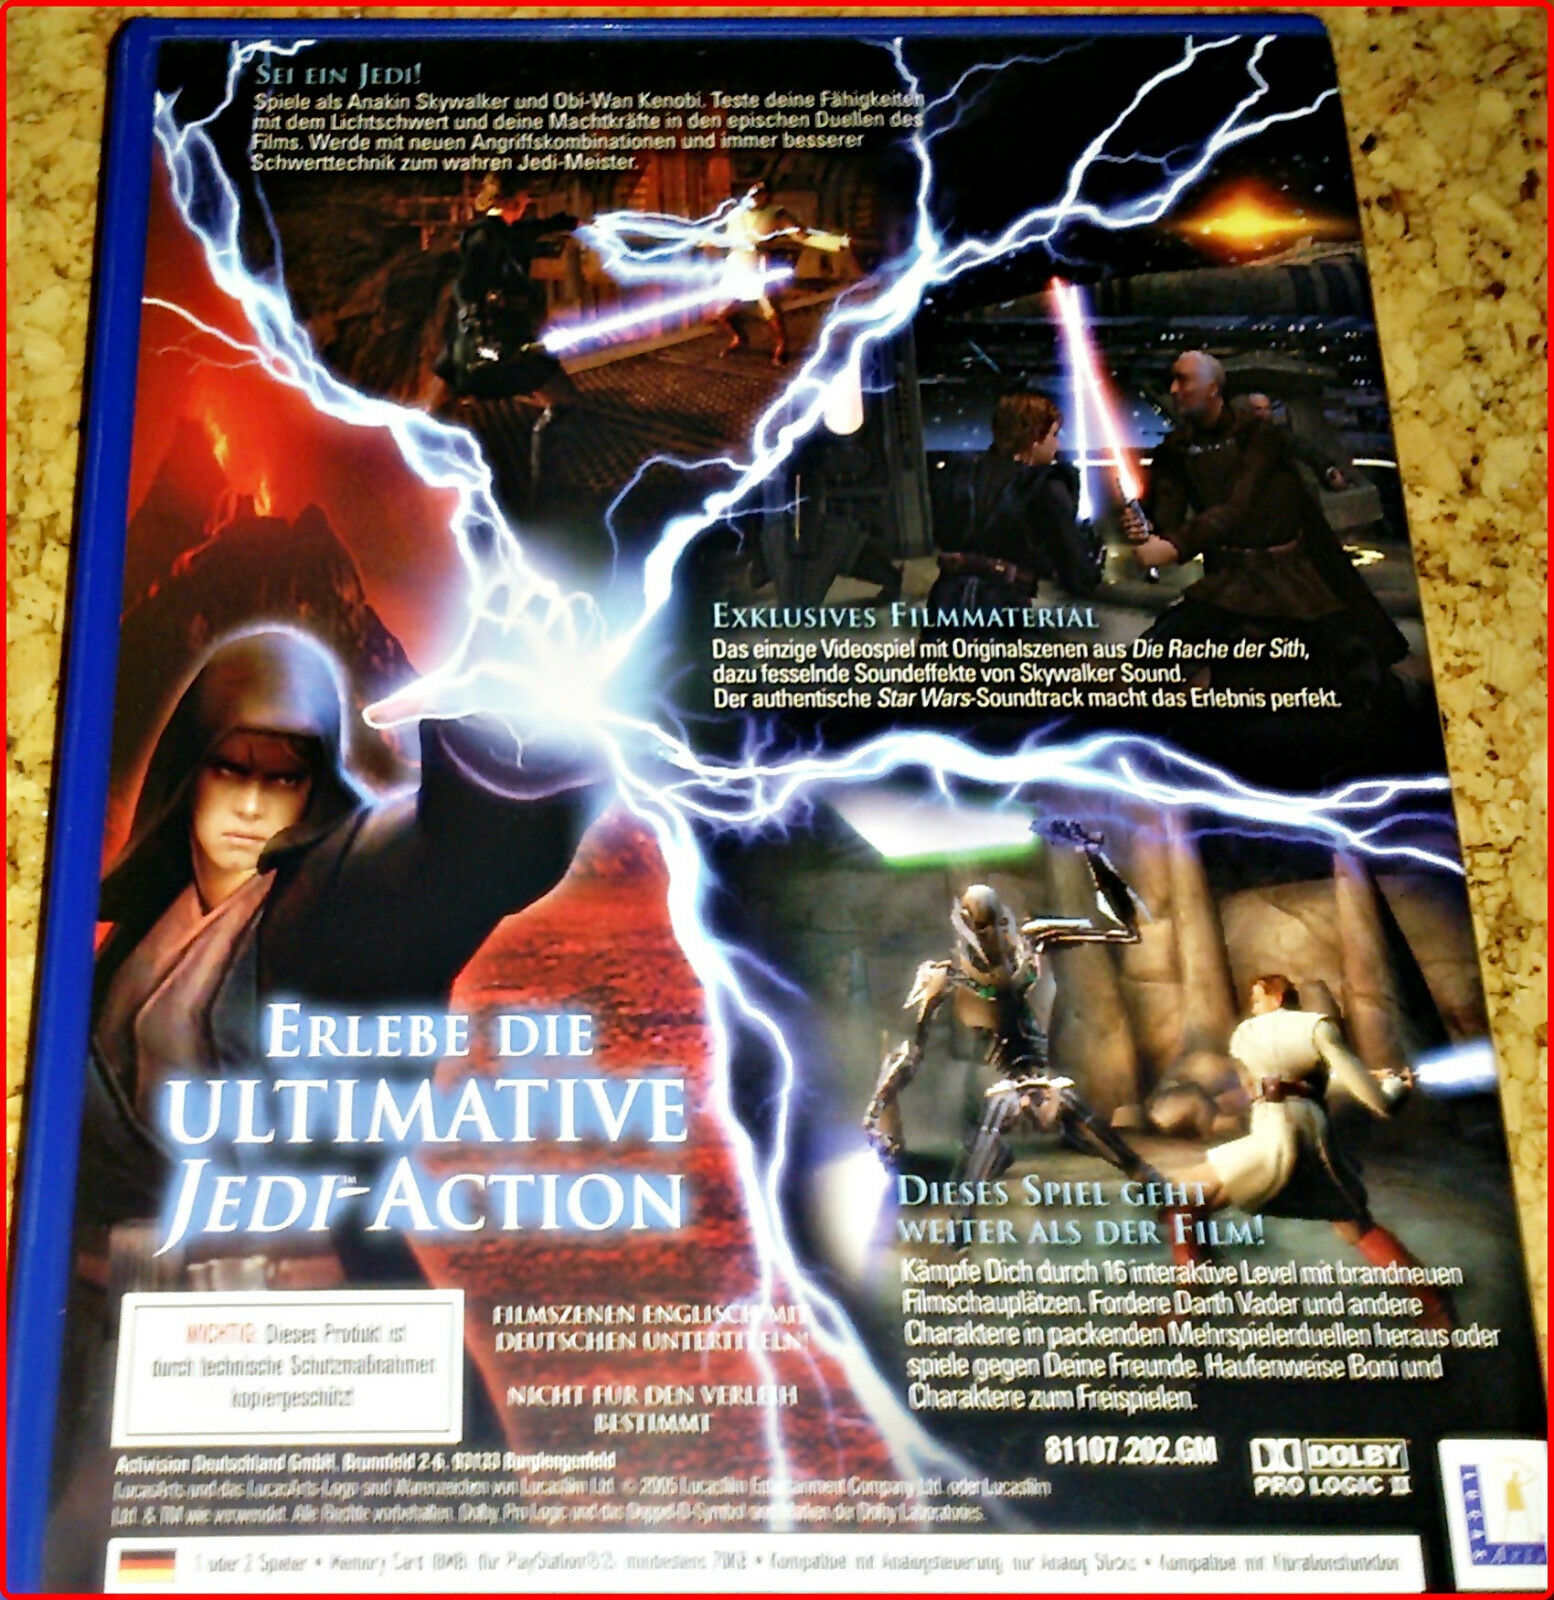 PS2 3 STAR WARS GAMES BOUNDLE: BATTLEFRONT + - Avis StarWars